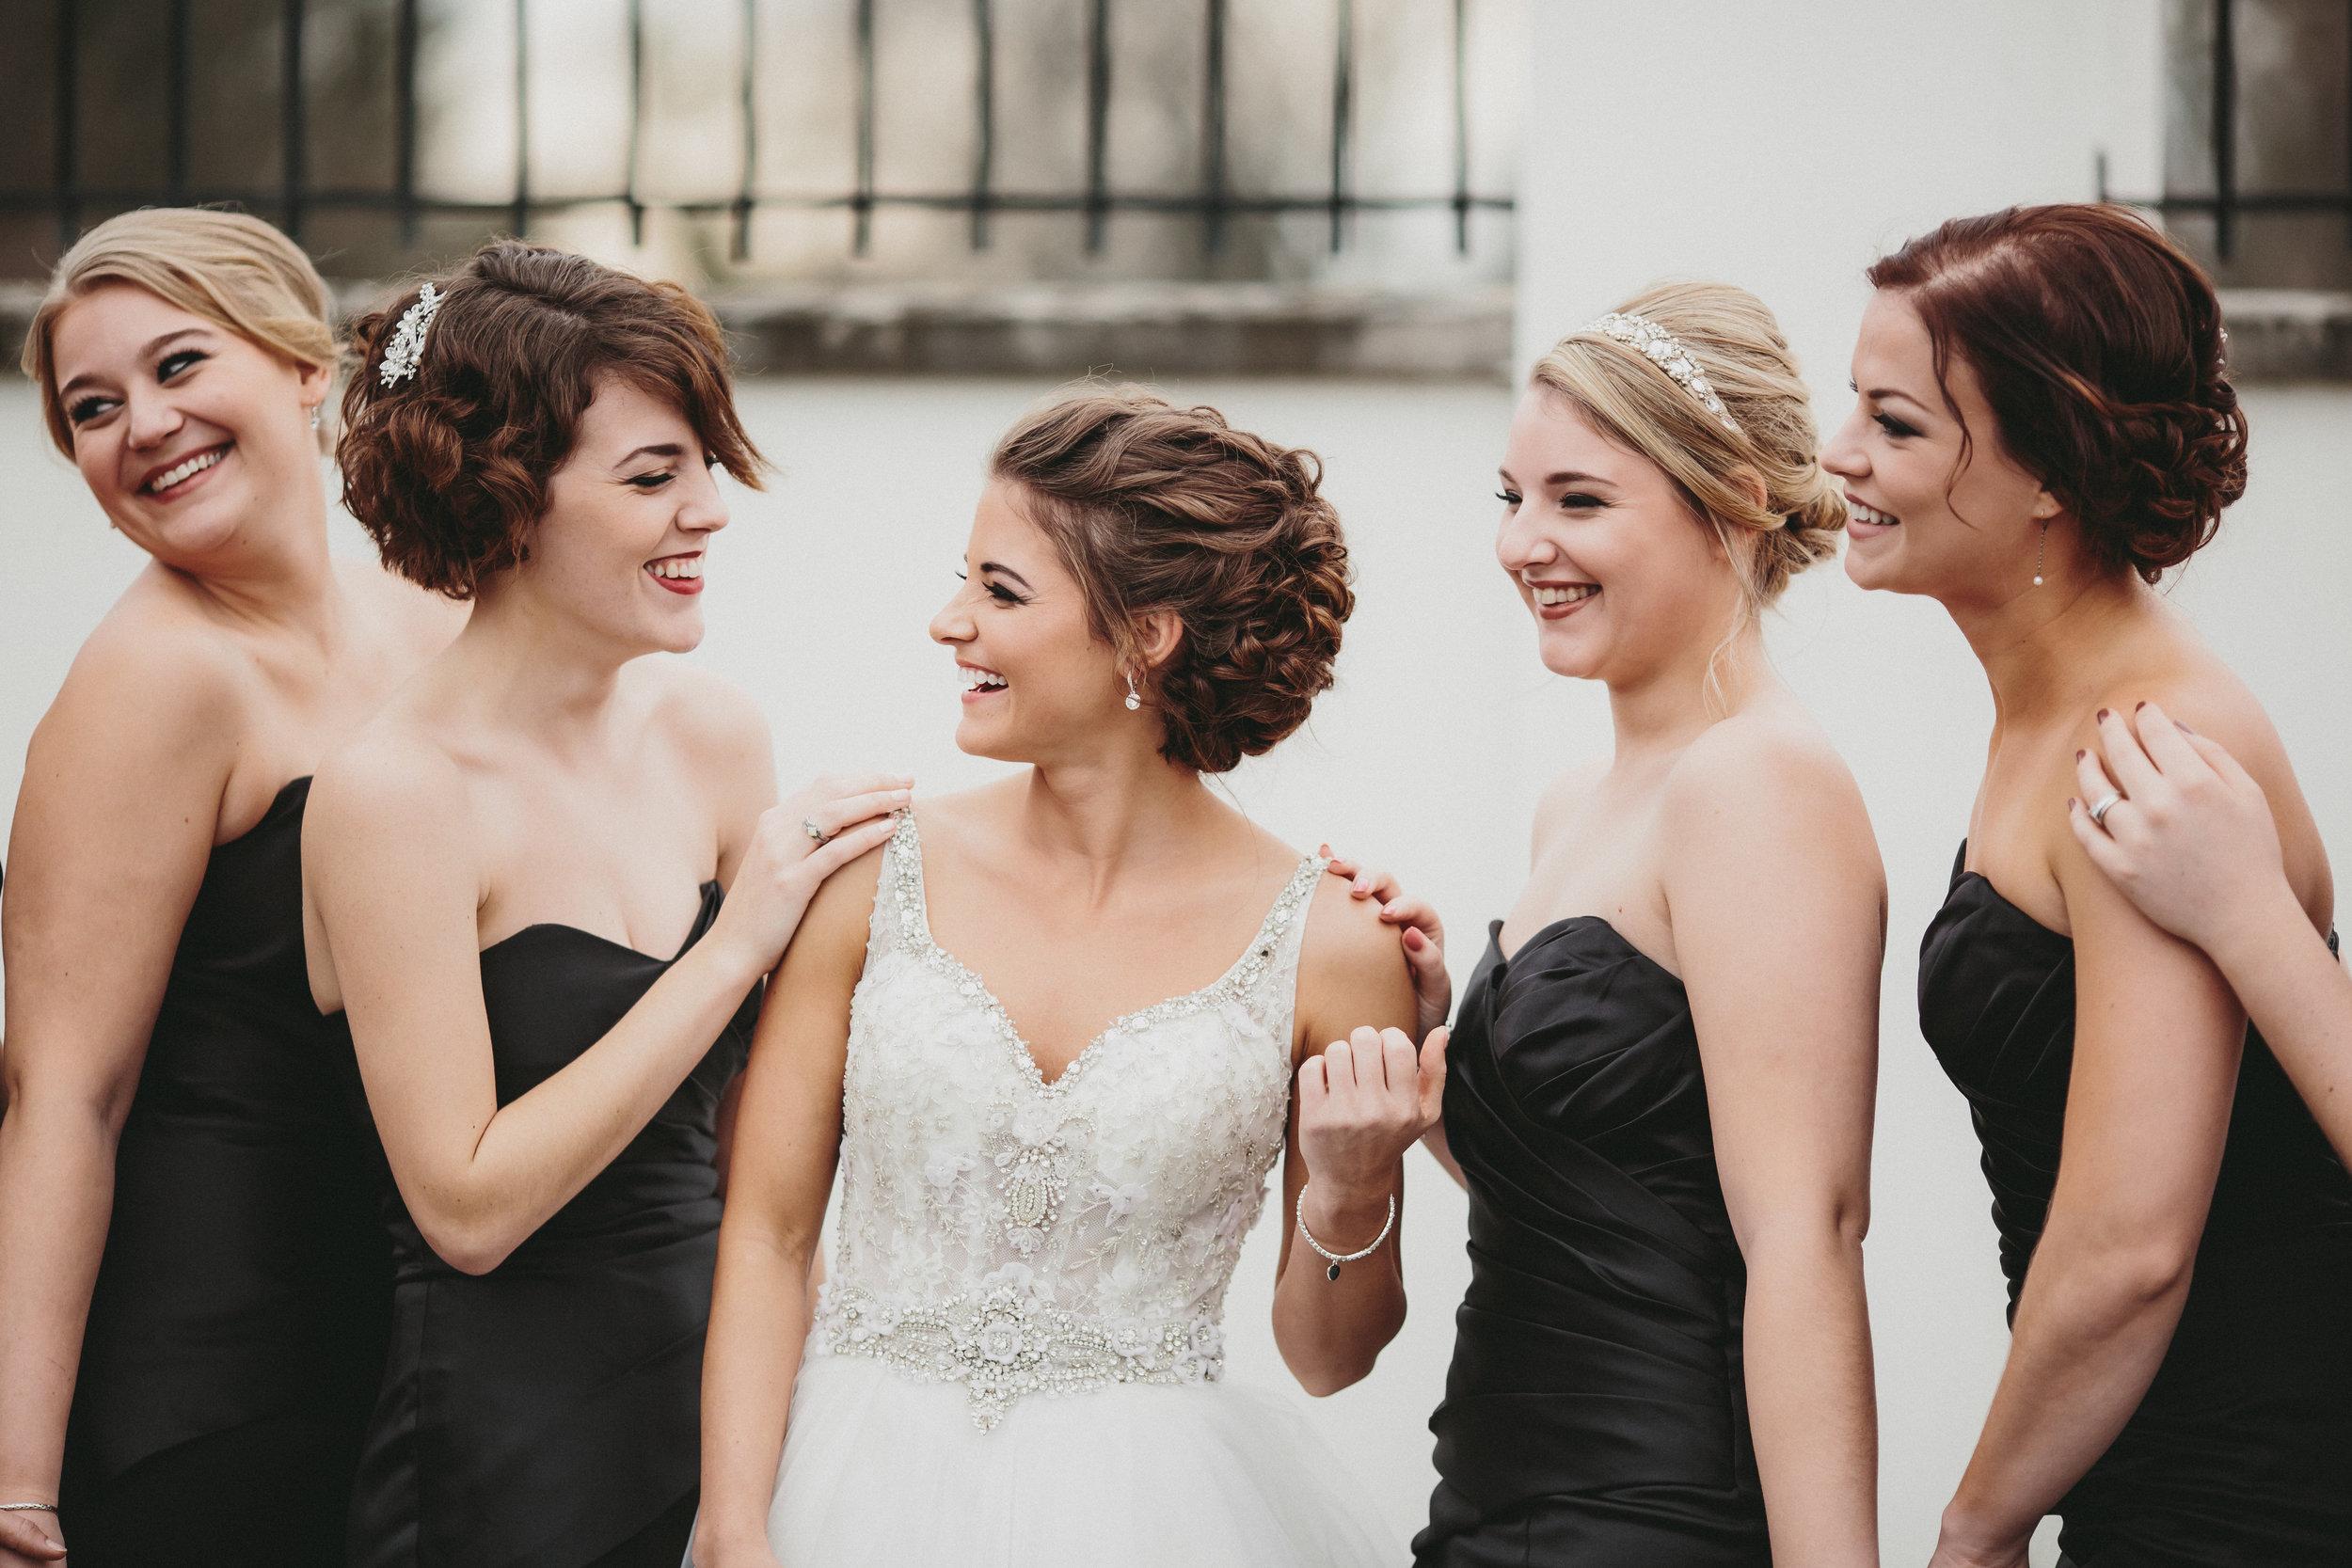 the_carrs_photography_chelsea_kirk_wedding_0197.jpg